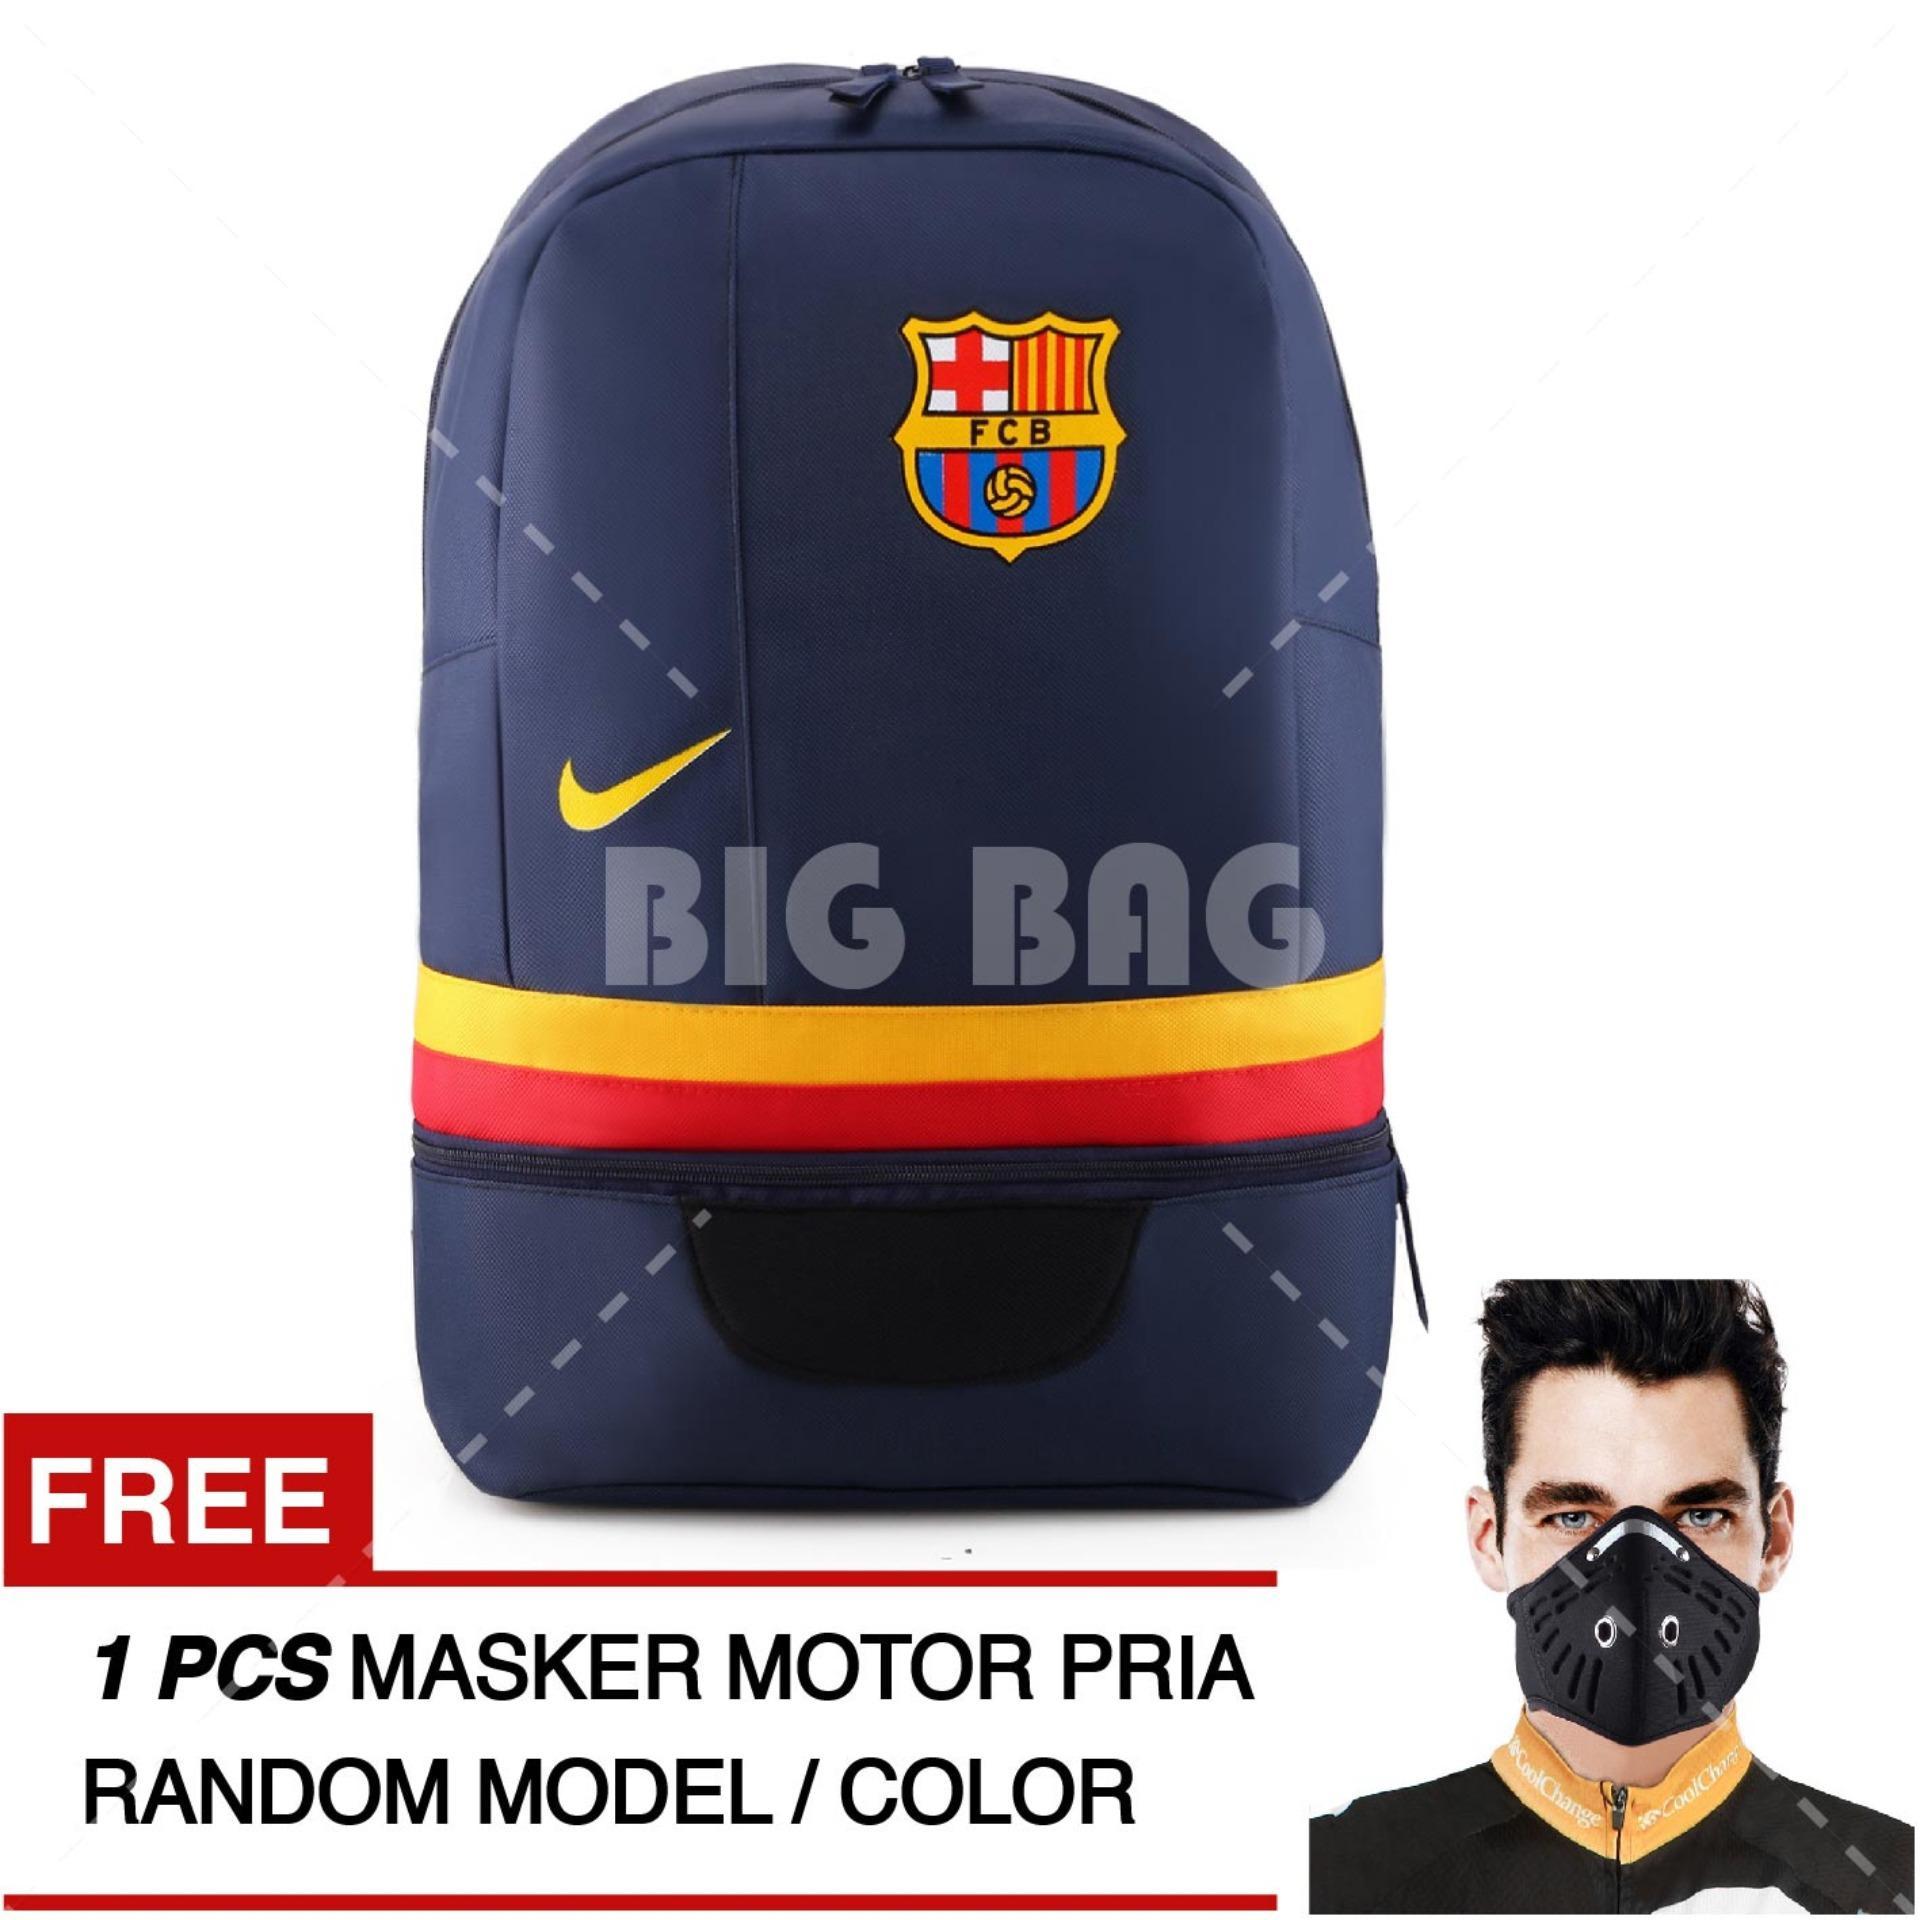 Tas Ransel Bola Pria Nike FC Barcelona Laptop Backpack Men Soccer Editions - Navy + Raincover + FREE Masker Motor Pria